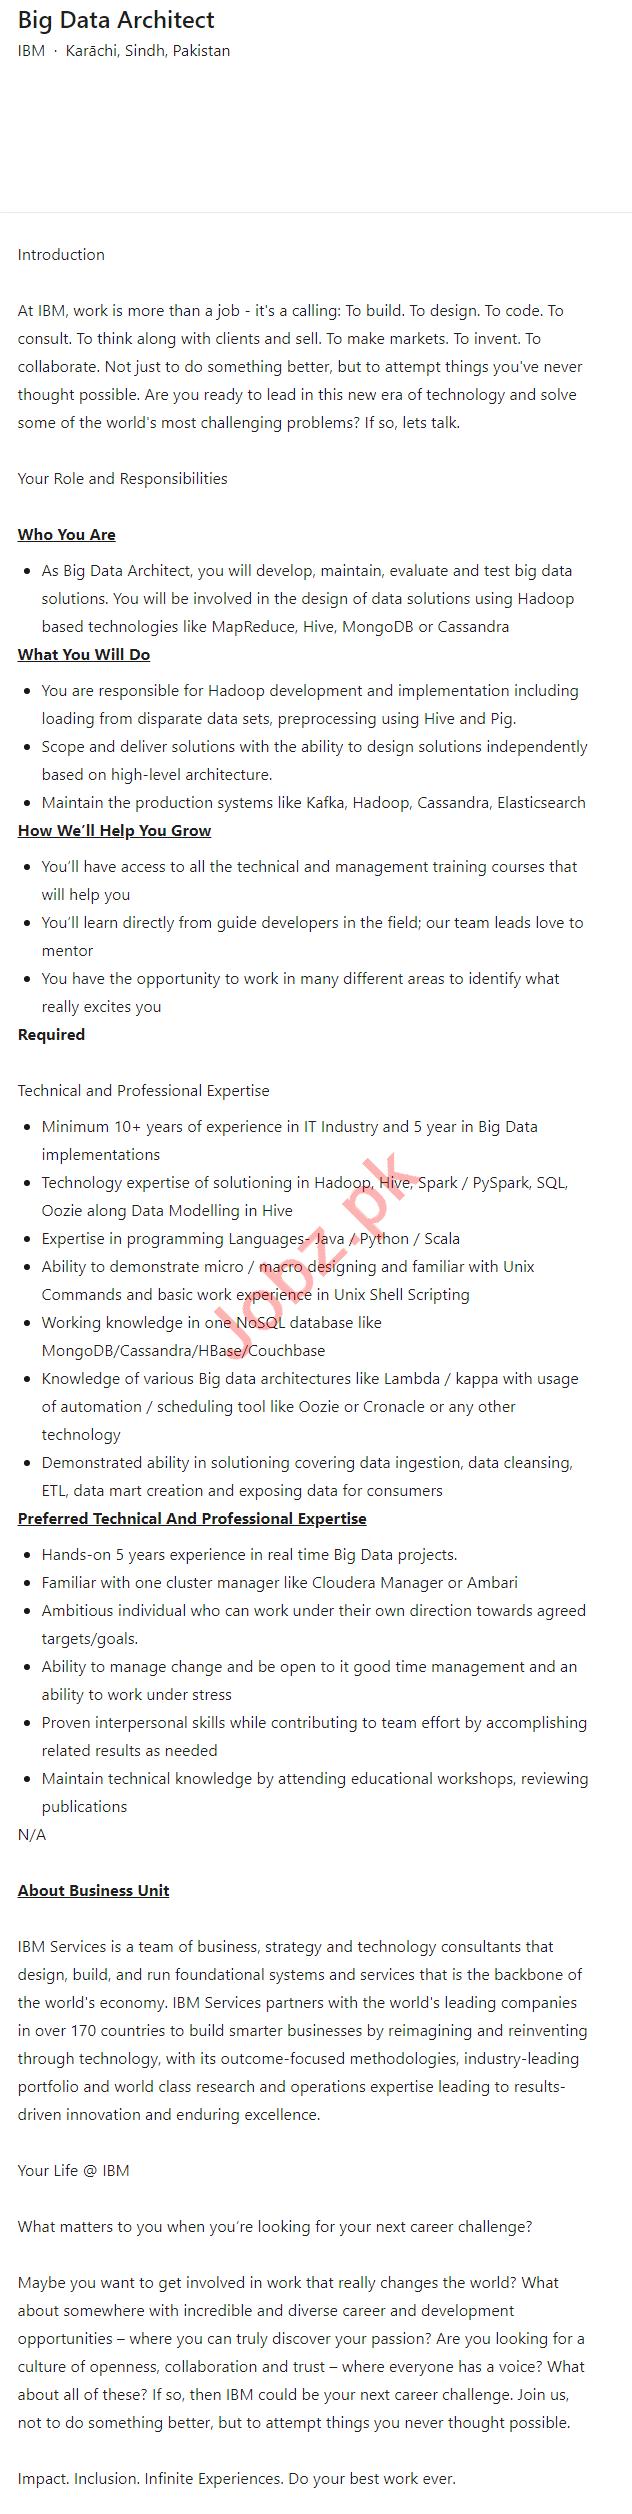 IBM Pakistan Jobs 2021 for Big Data Architect